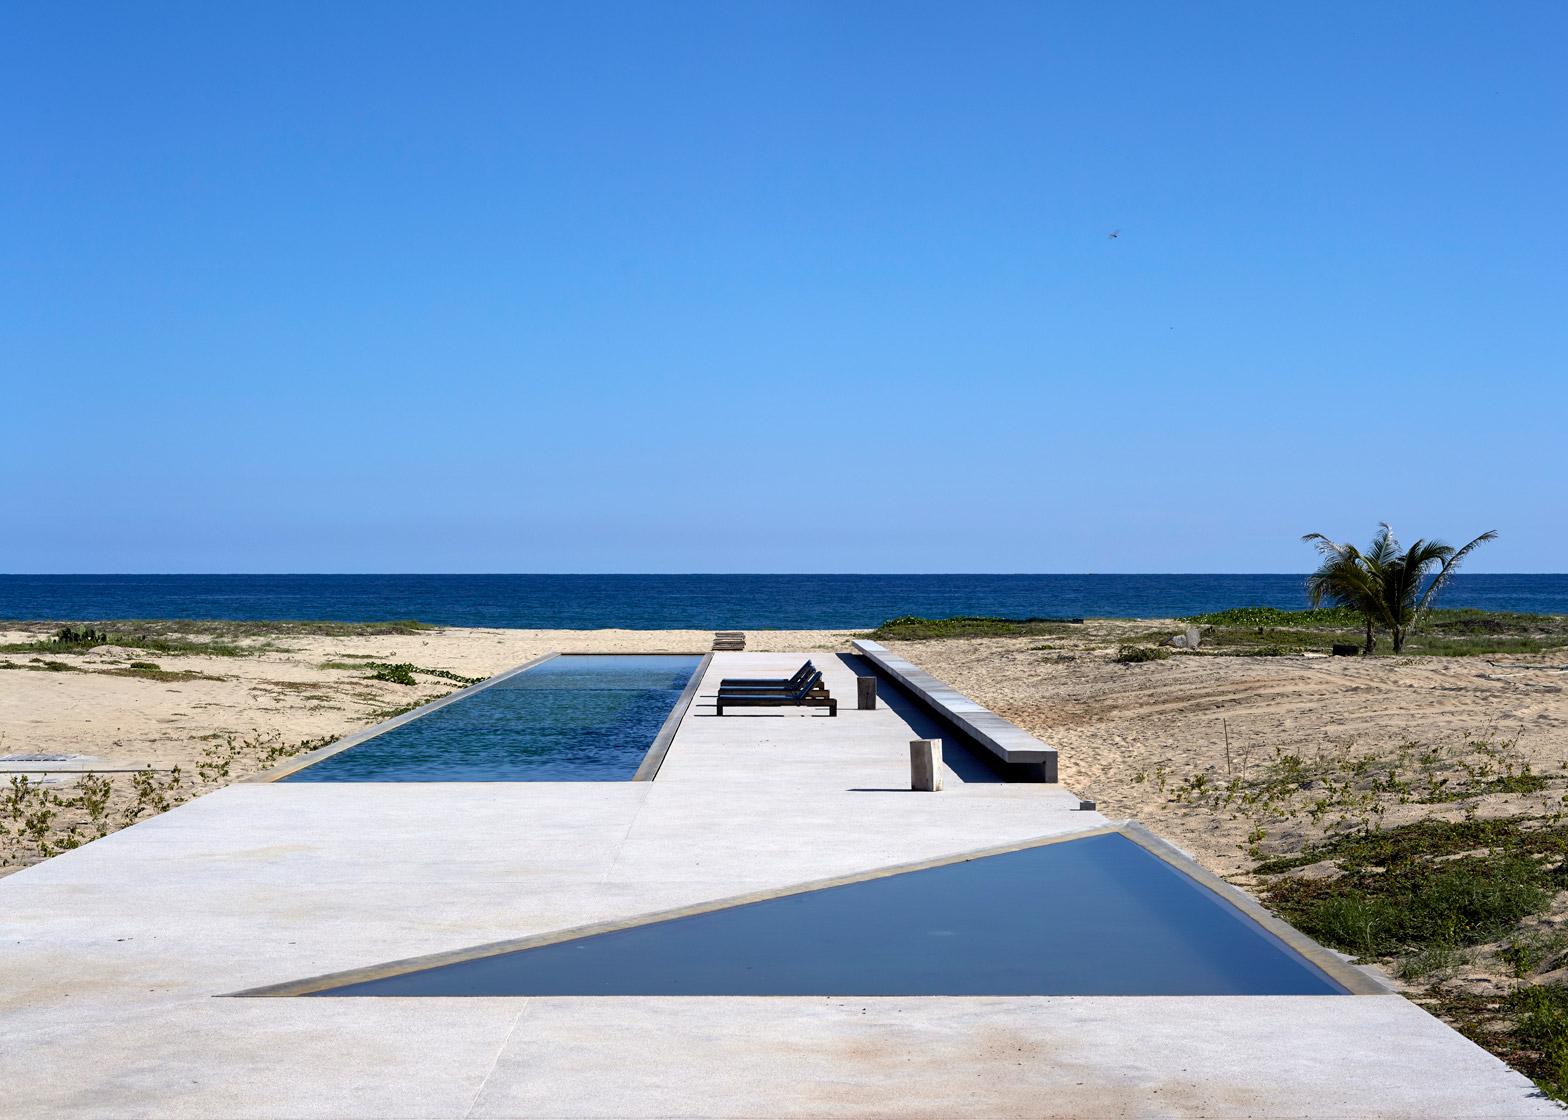 Casa-Wabi_Bosco-Studio-House_Tadao-Ando_Puerto-Escondido_Oaxaca_Mexico_dezeen_1568_4.jpg